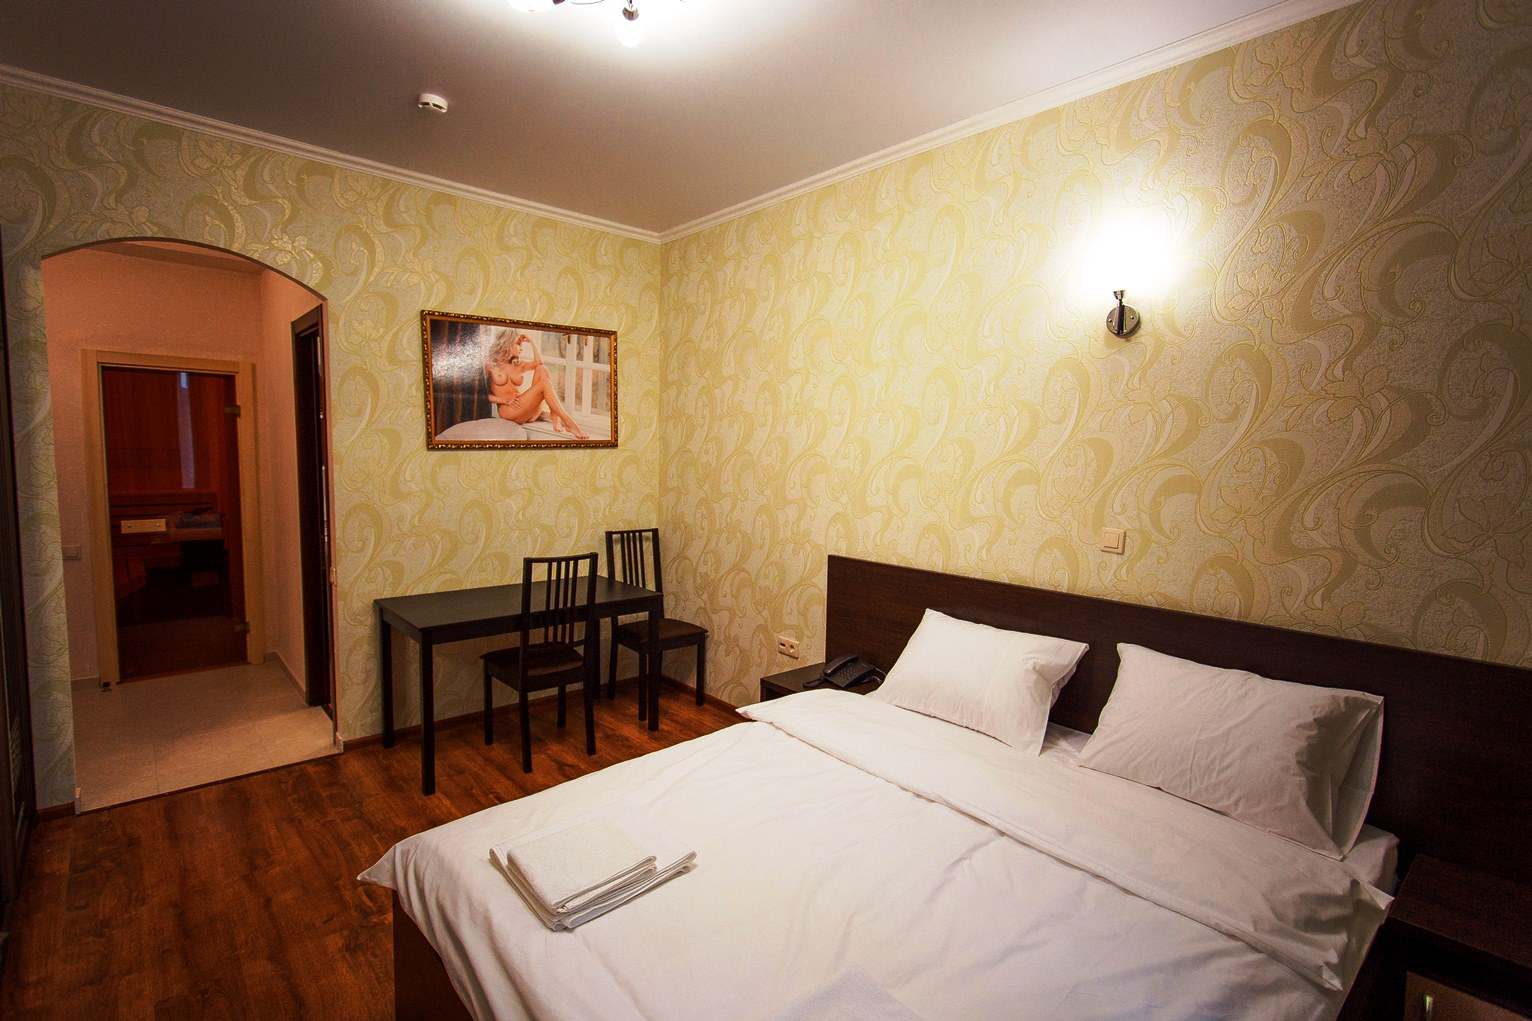 pano-castro-floor-suite-sauna-3[1]